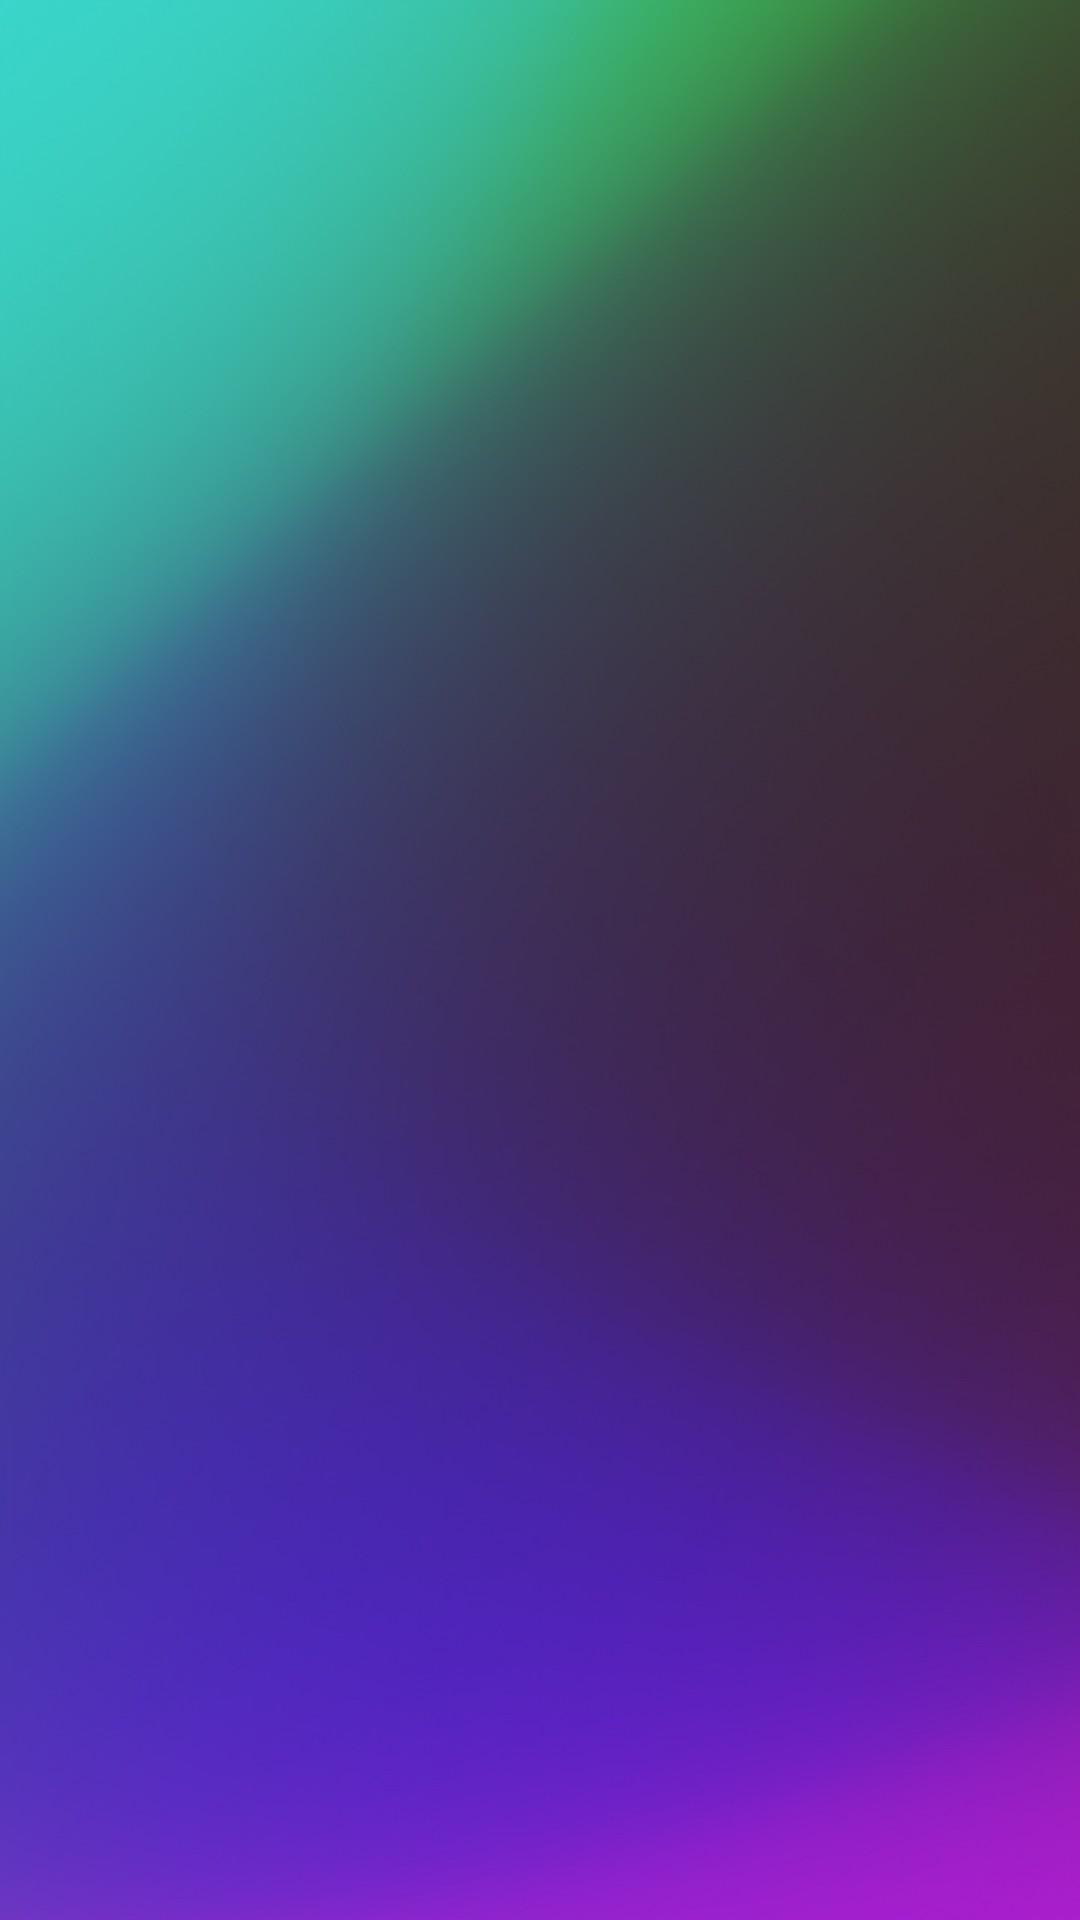 Iphone 6s Carbon Fiber Wallpaper Violet Gradient 4k 5k Wallpapers Hd Wallpapers Id 27046